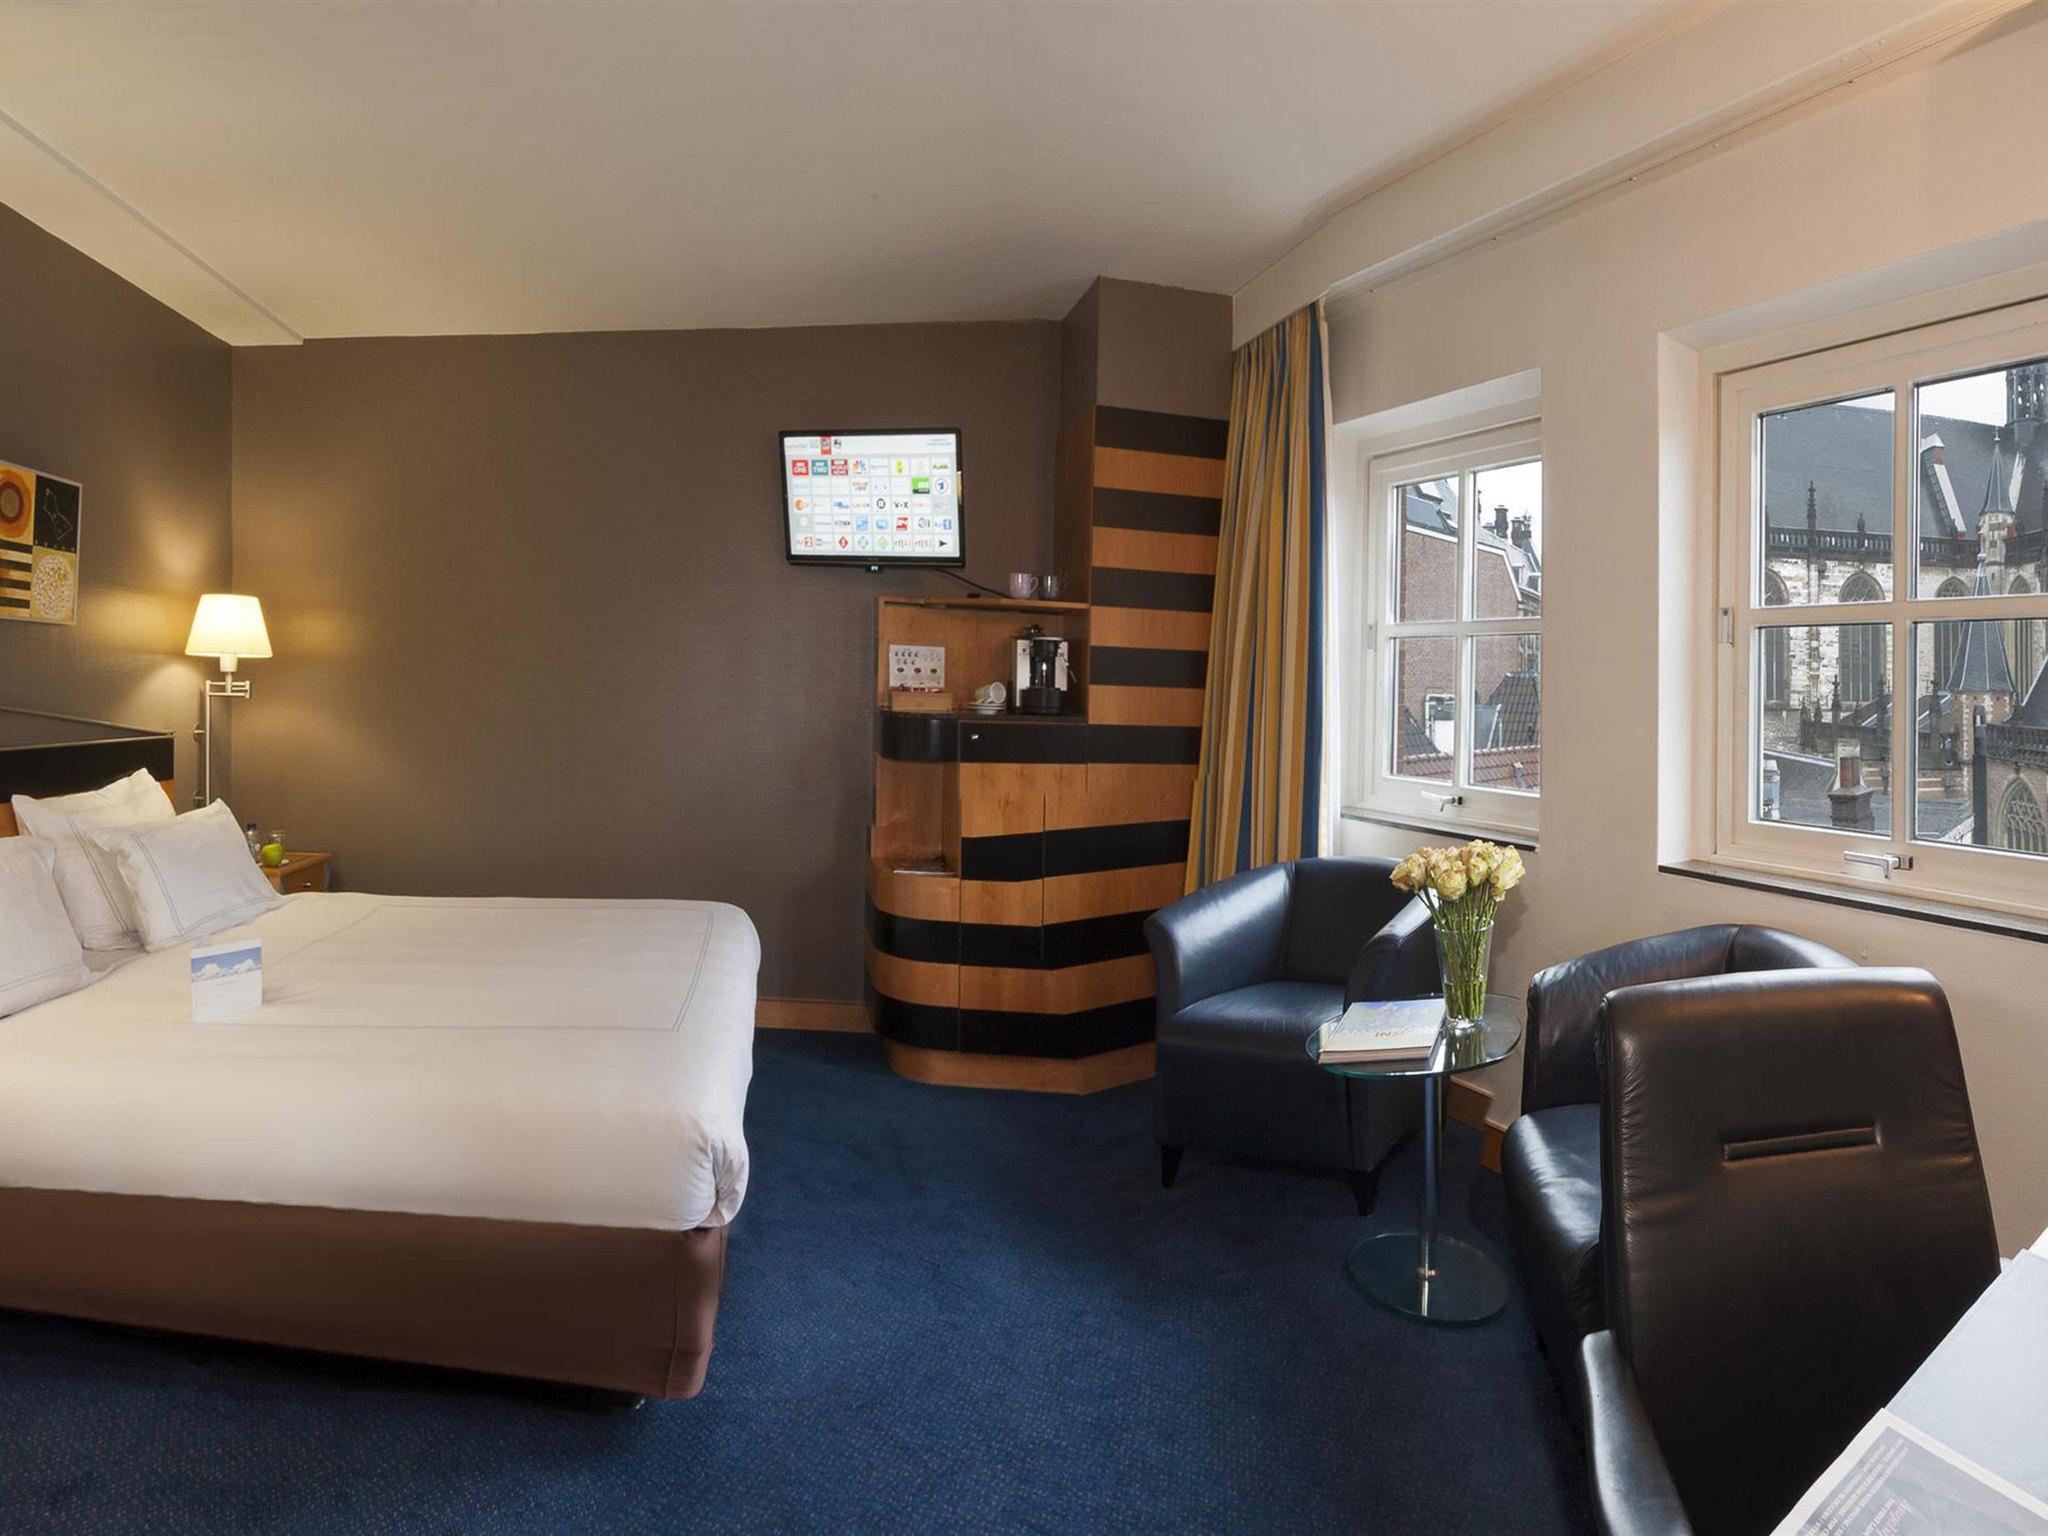 Luxury Hotel Amsterdam Centre Swissotel Near Dam Square